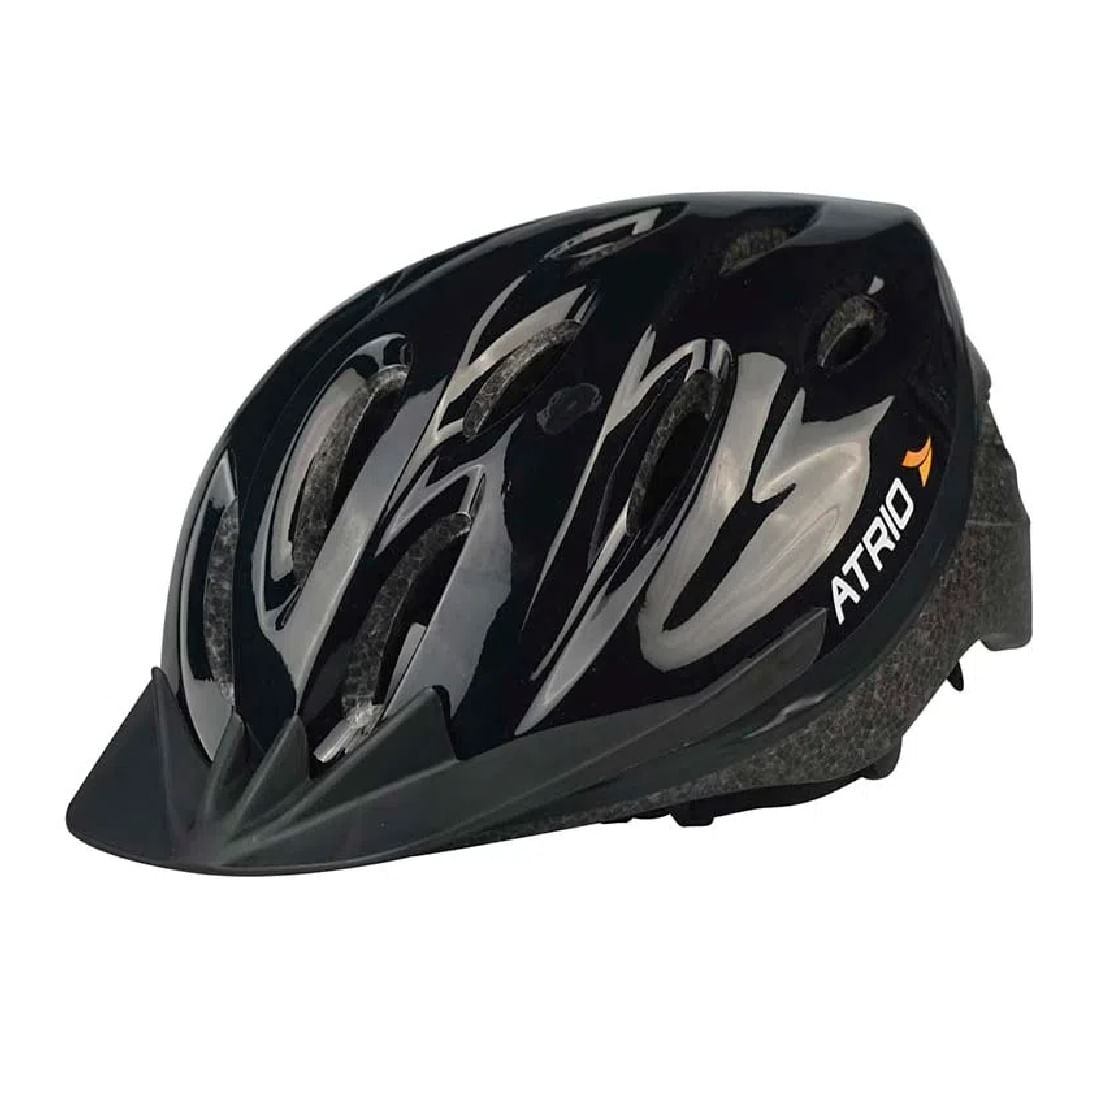 Capacete-de-Bike-MTB-2.0-Atrio-BI003-Preto-com-Viseira---9765--1-